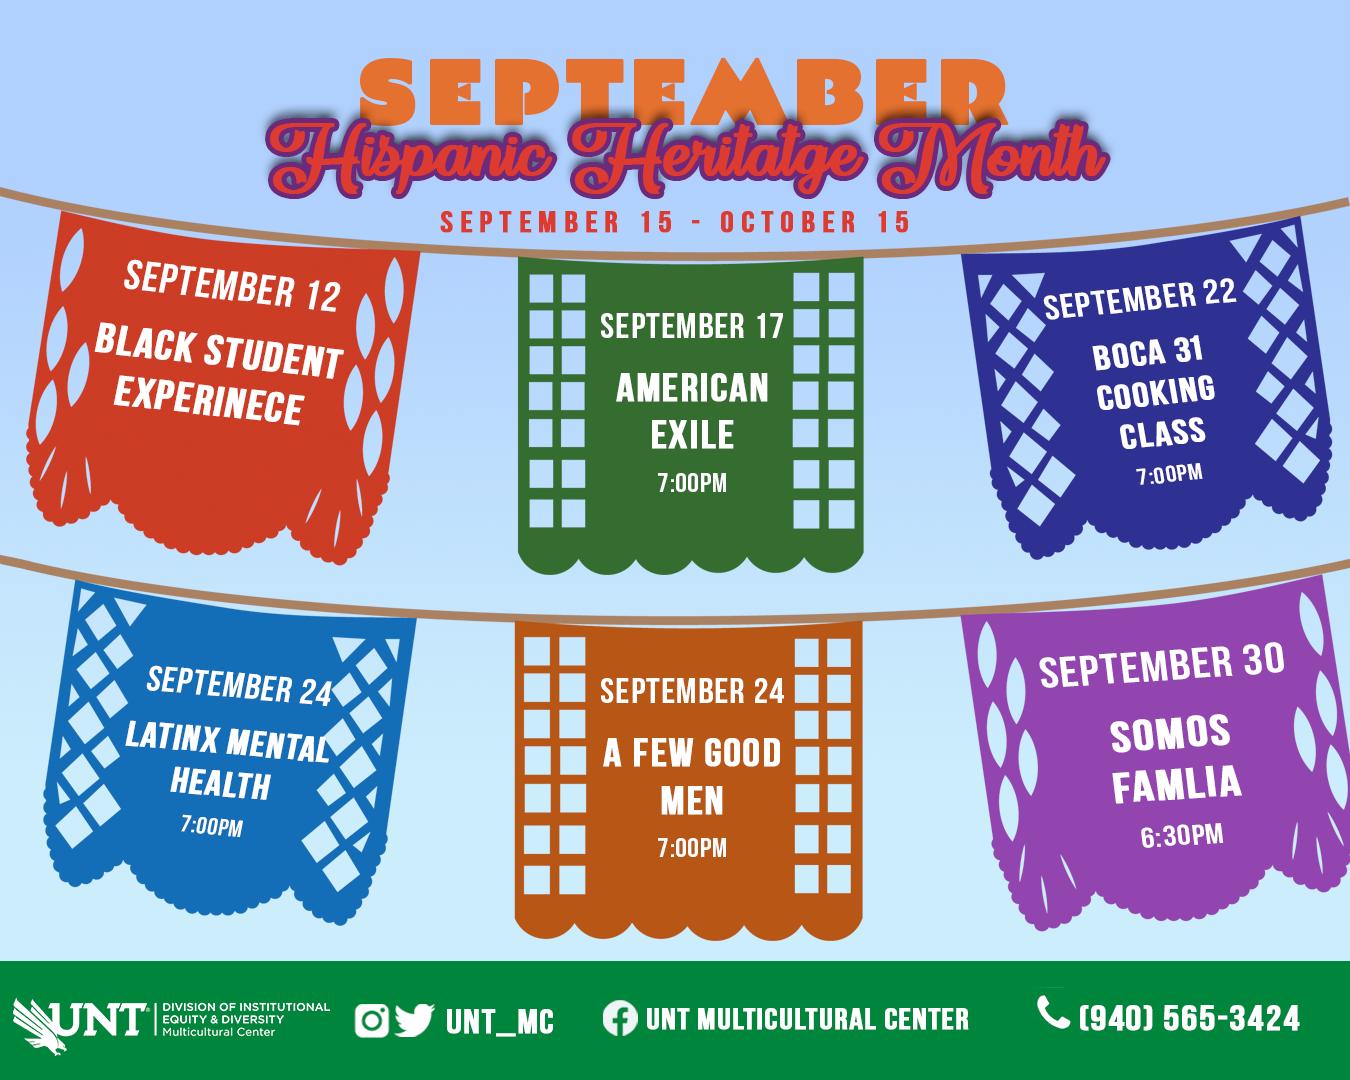 Sept MC Hispanic Heritage Month events pic